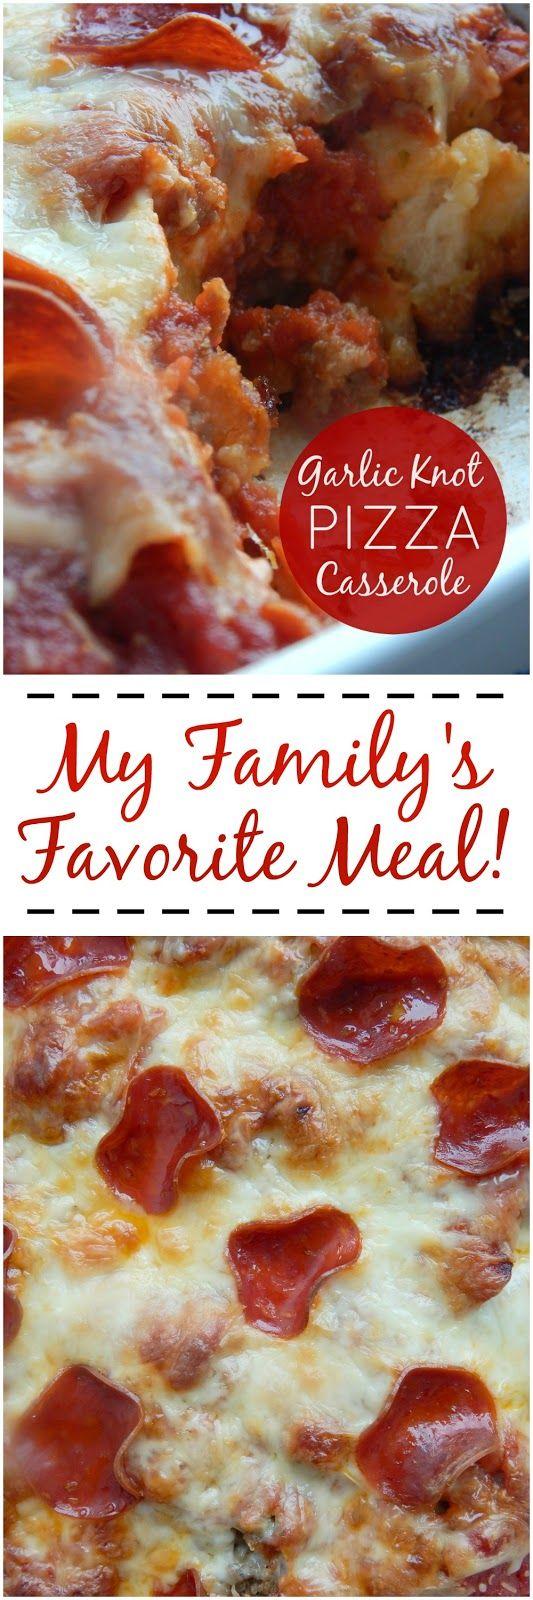 garlic knot pizza casserole (sweetandsavoryfood.com)